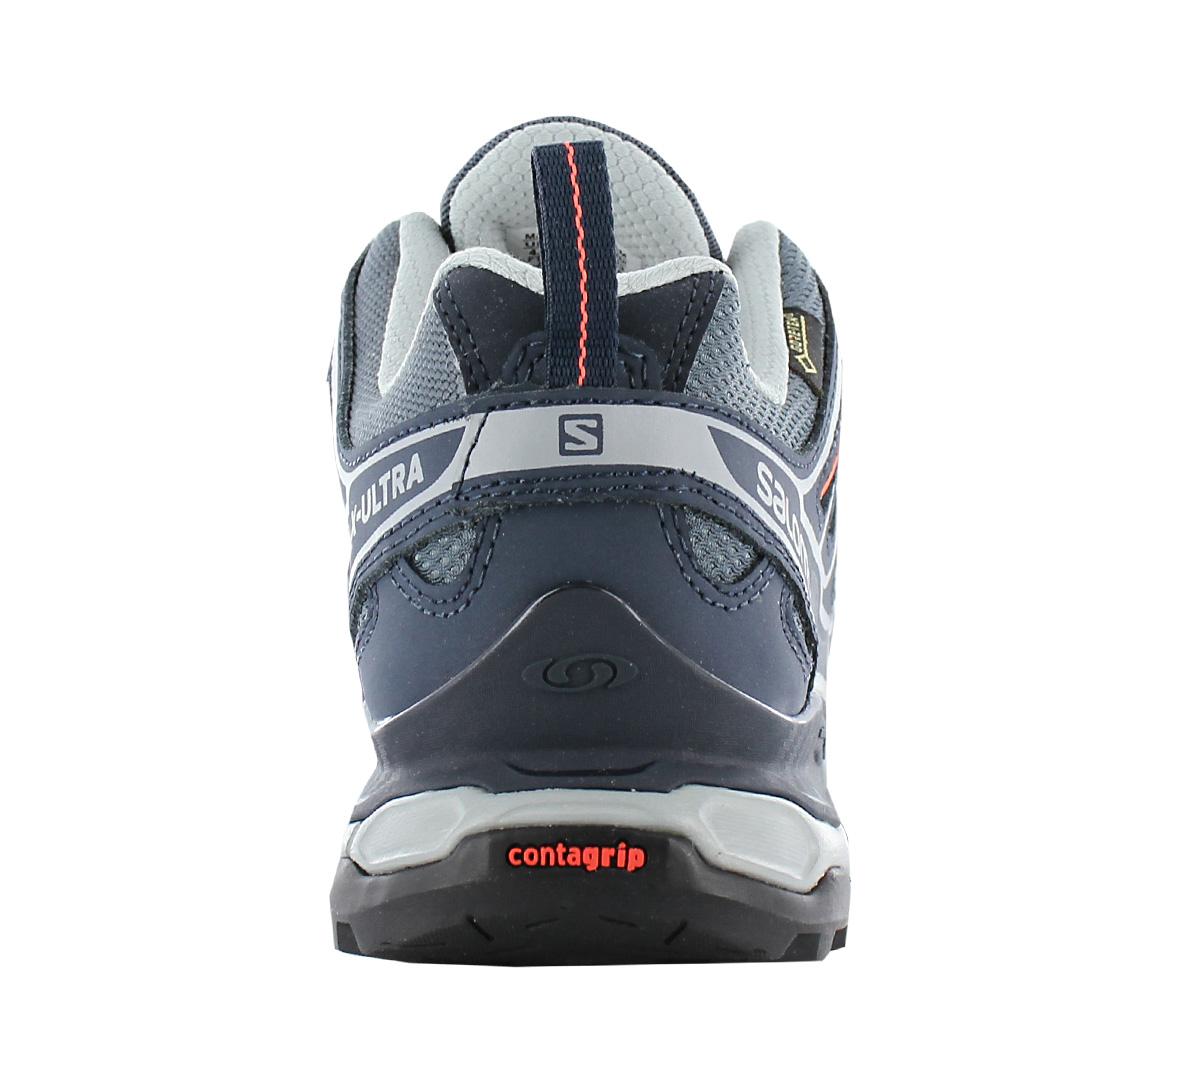 c585c298 Details about Salomon x Ultra 2 GTX W Gore-tex Ladies Hiking Shoes Trekking  Shoes 371595 New